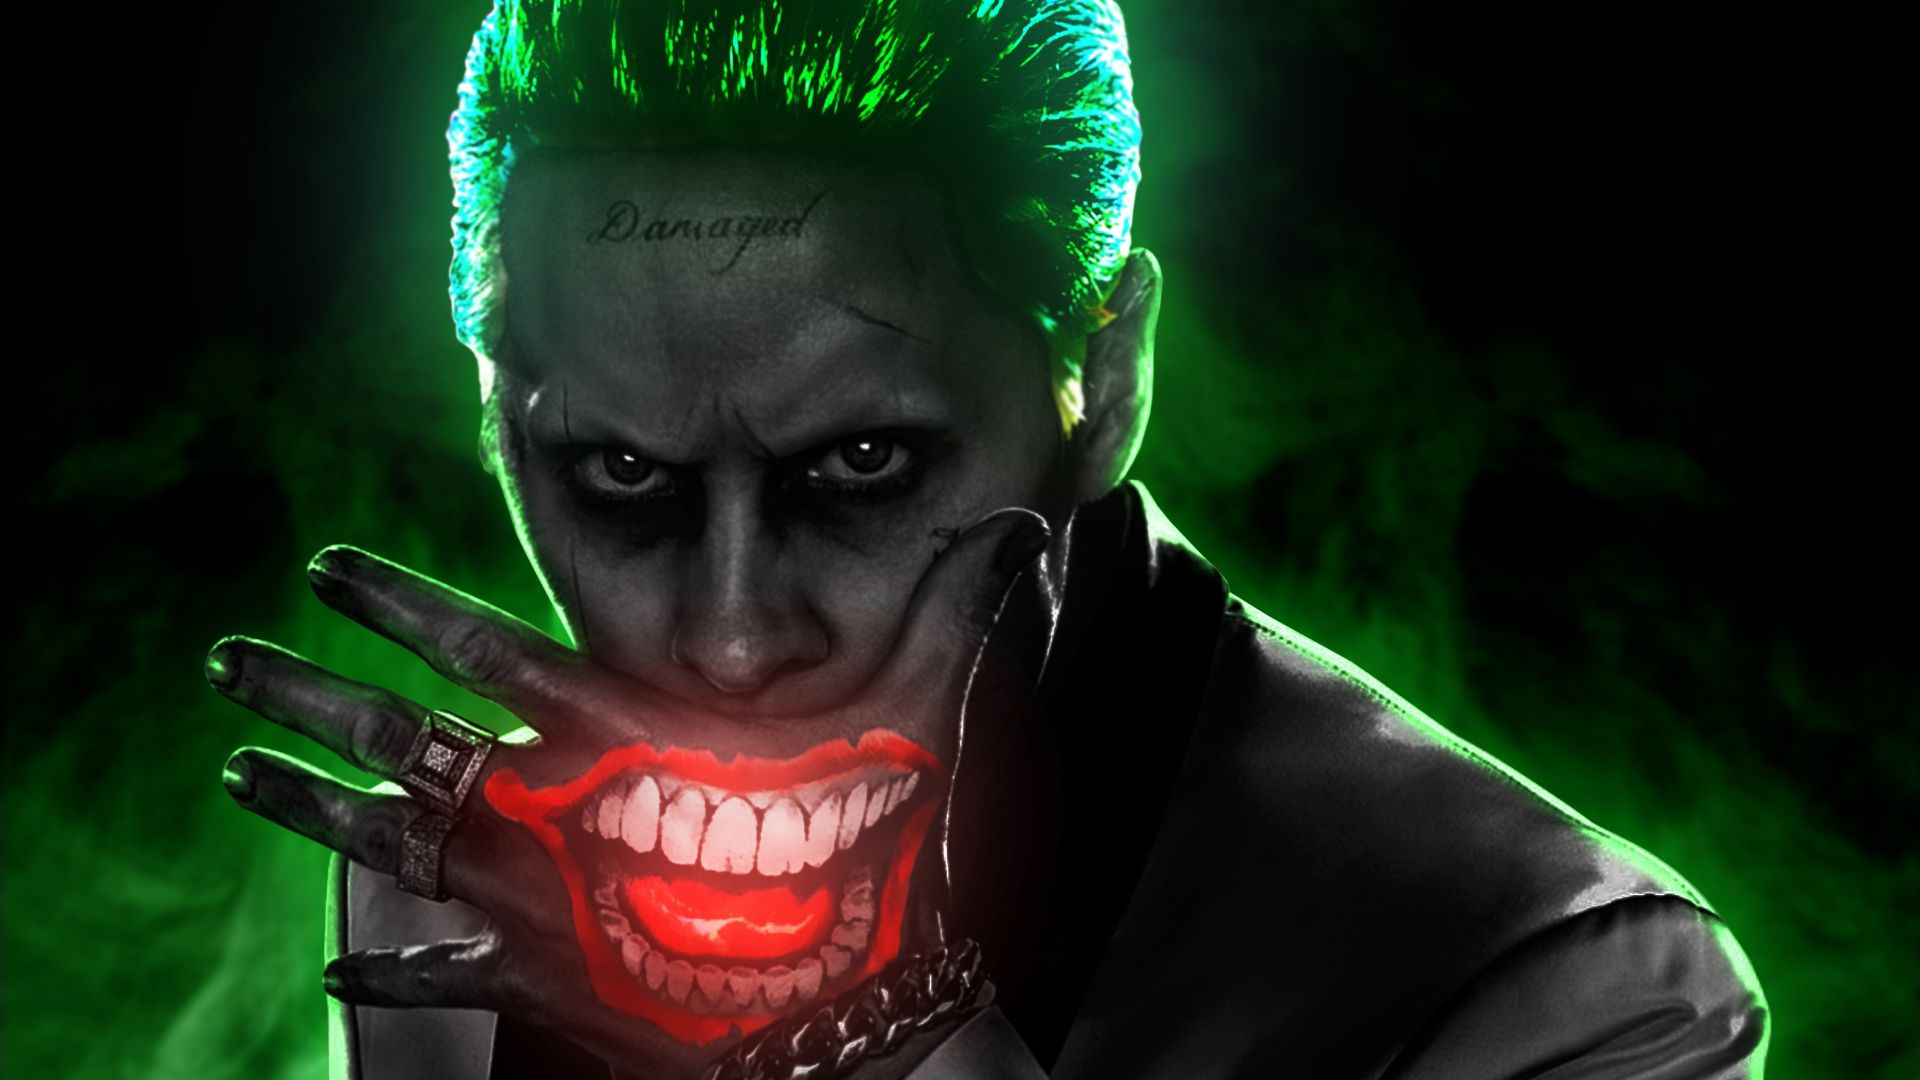 27 Suicide Squad Joker Wallpapers Wallpaperboat